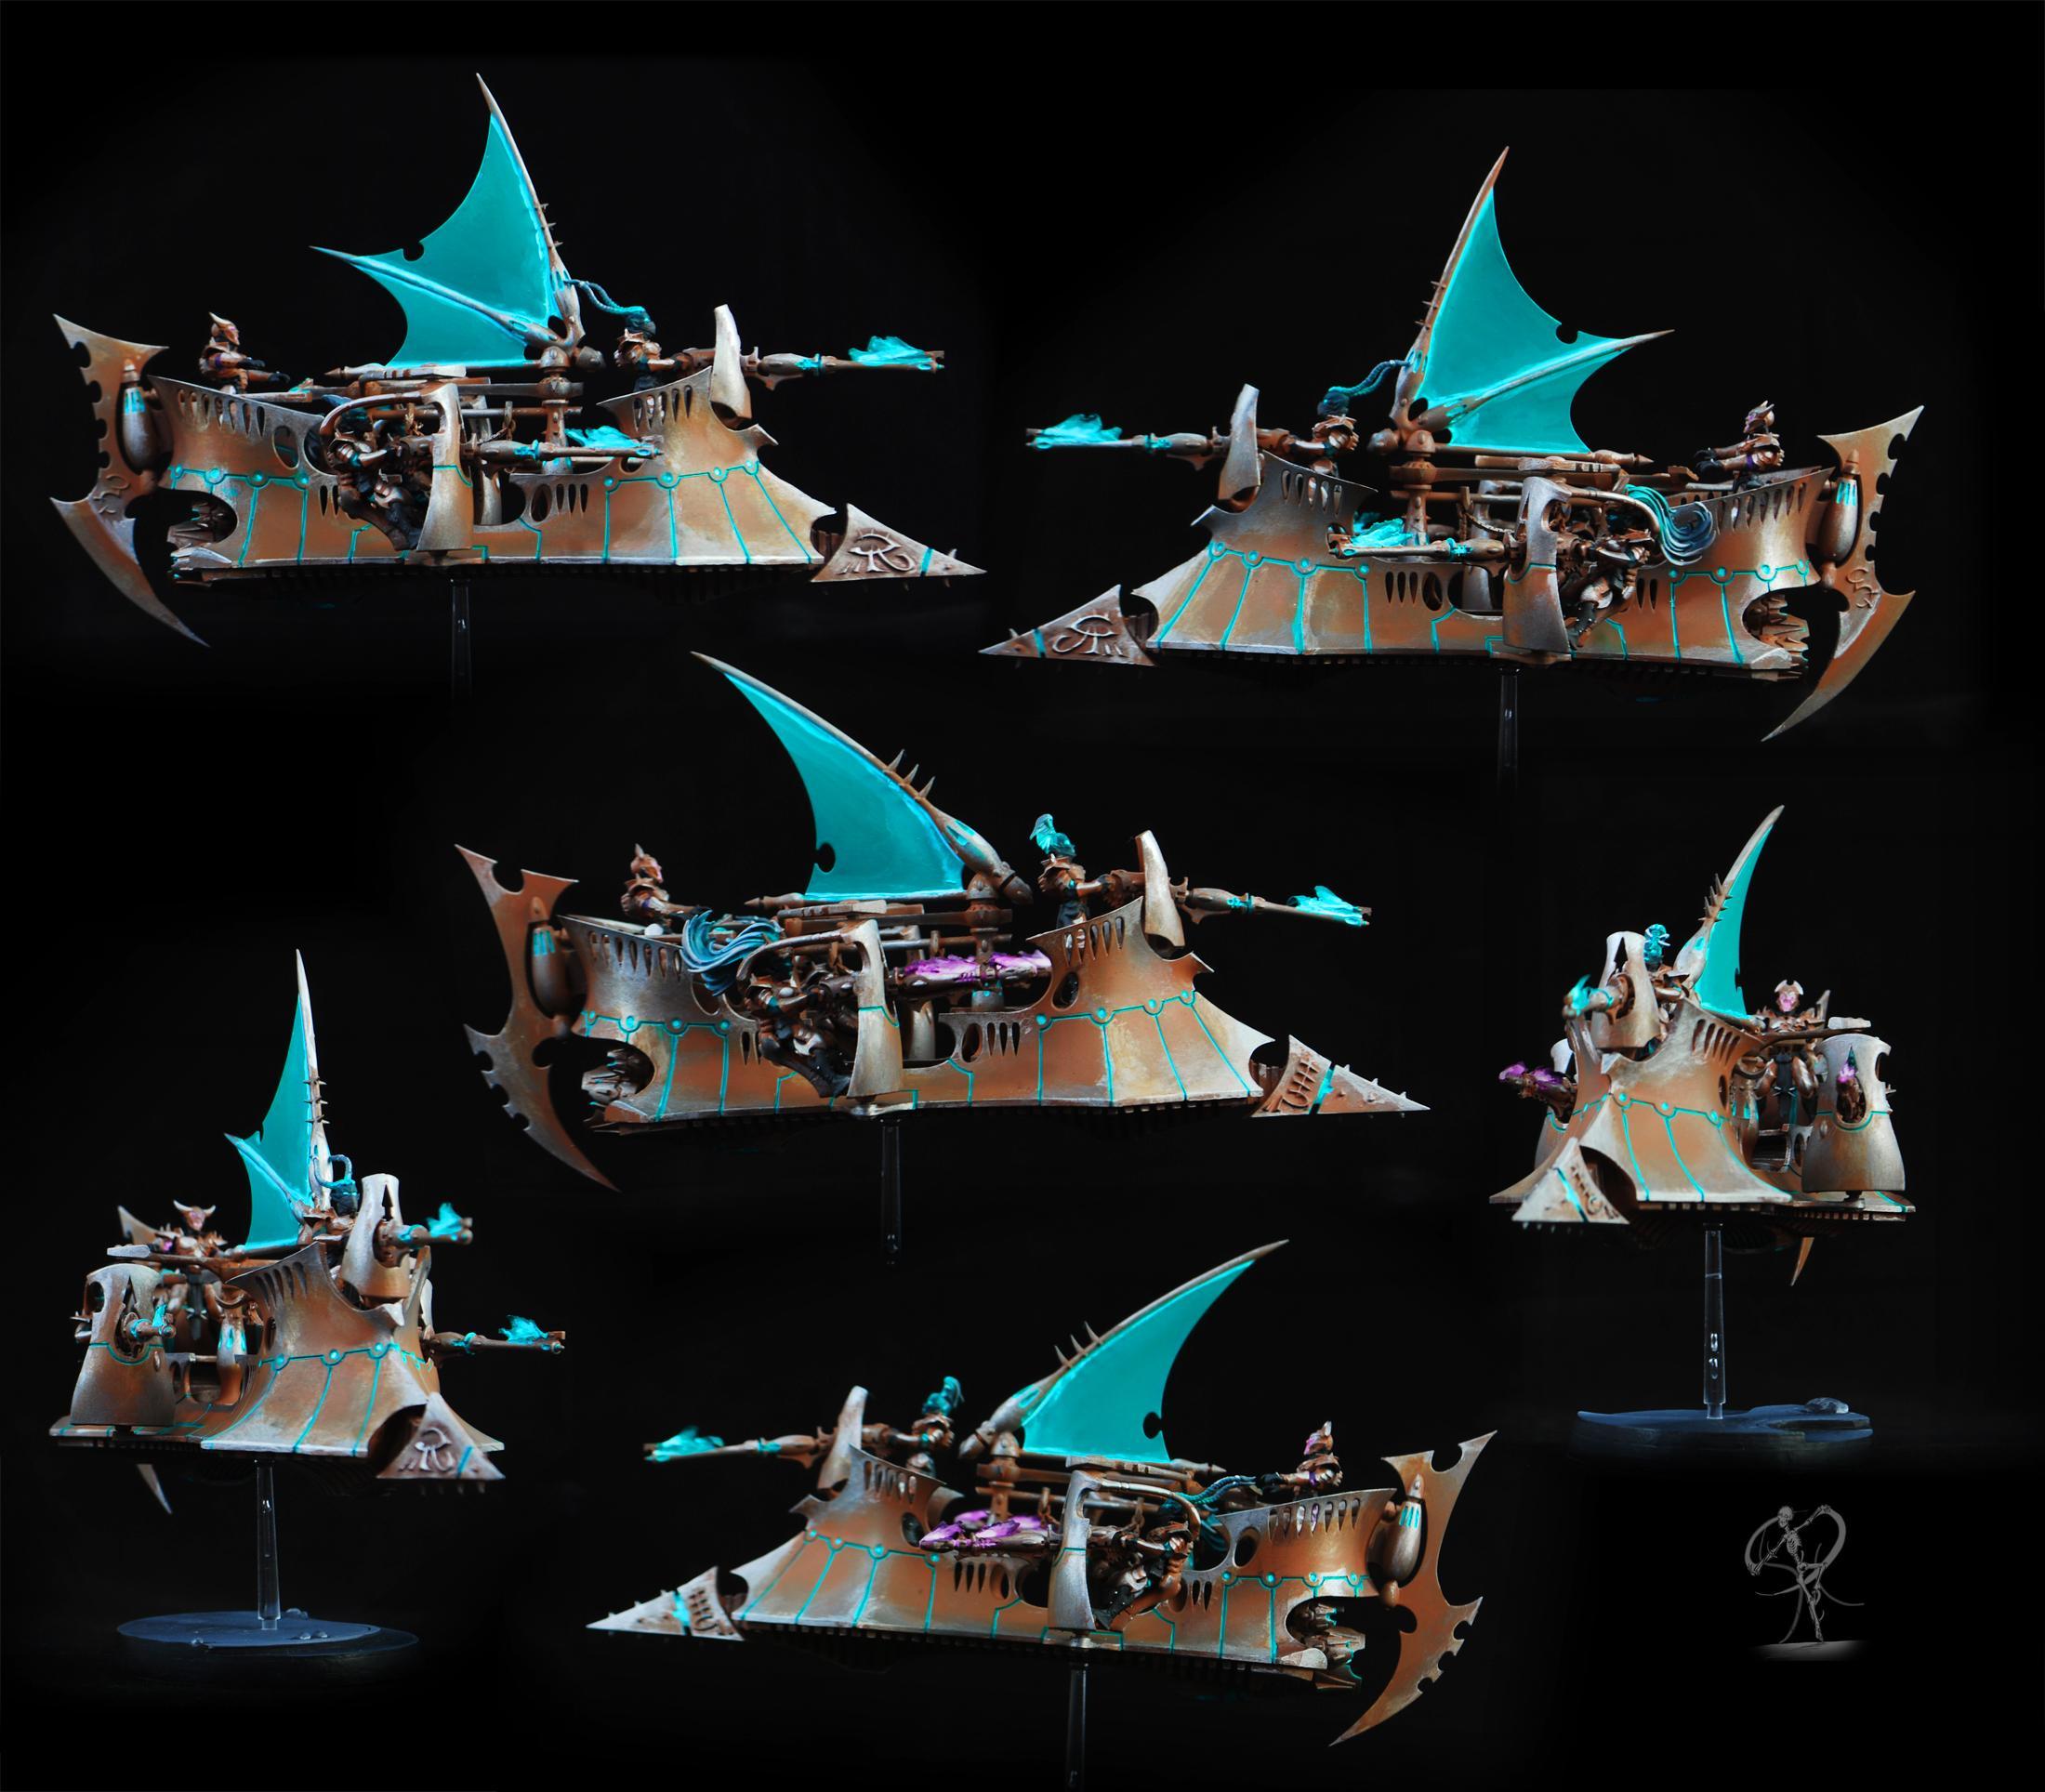 Dark Eldar, Drukhari, Eldar, Freehand, Mandrake, Object Source Lighting, Warhammer 40,000